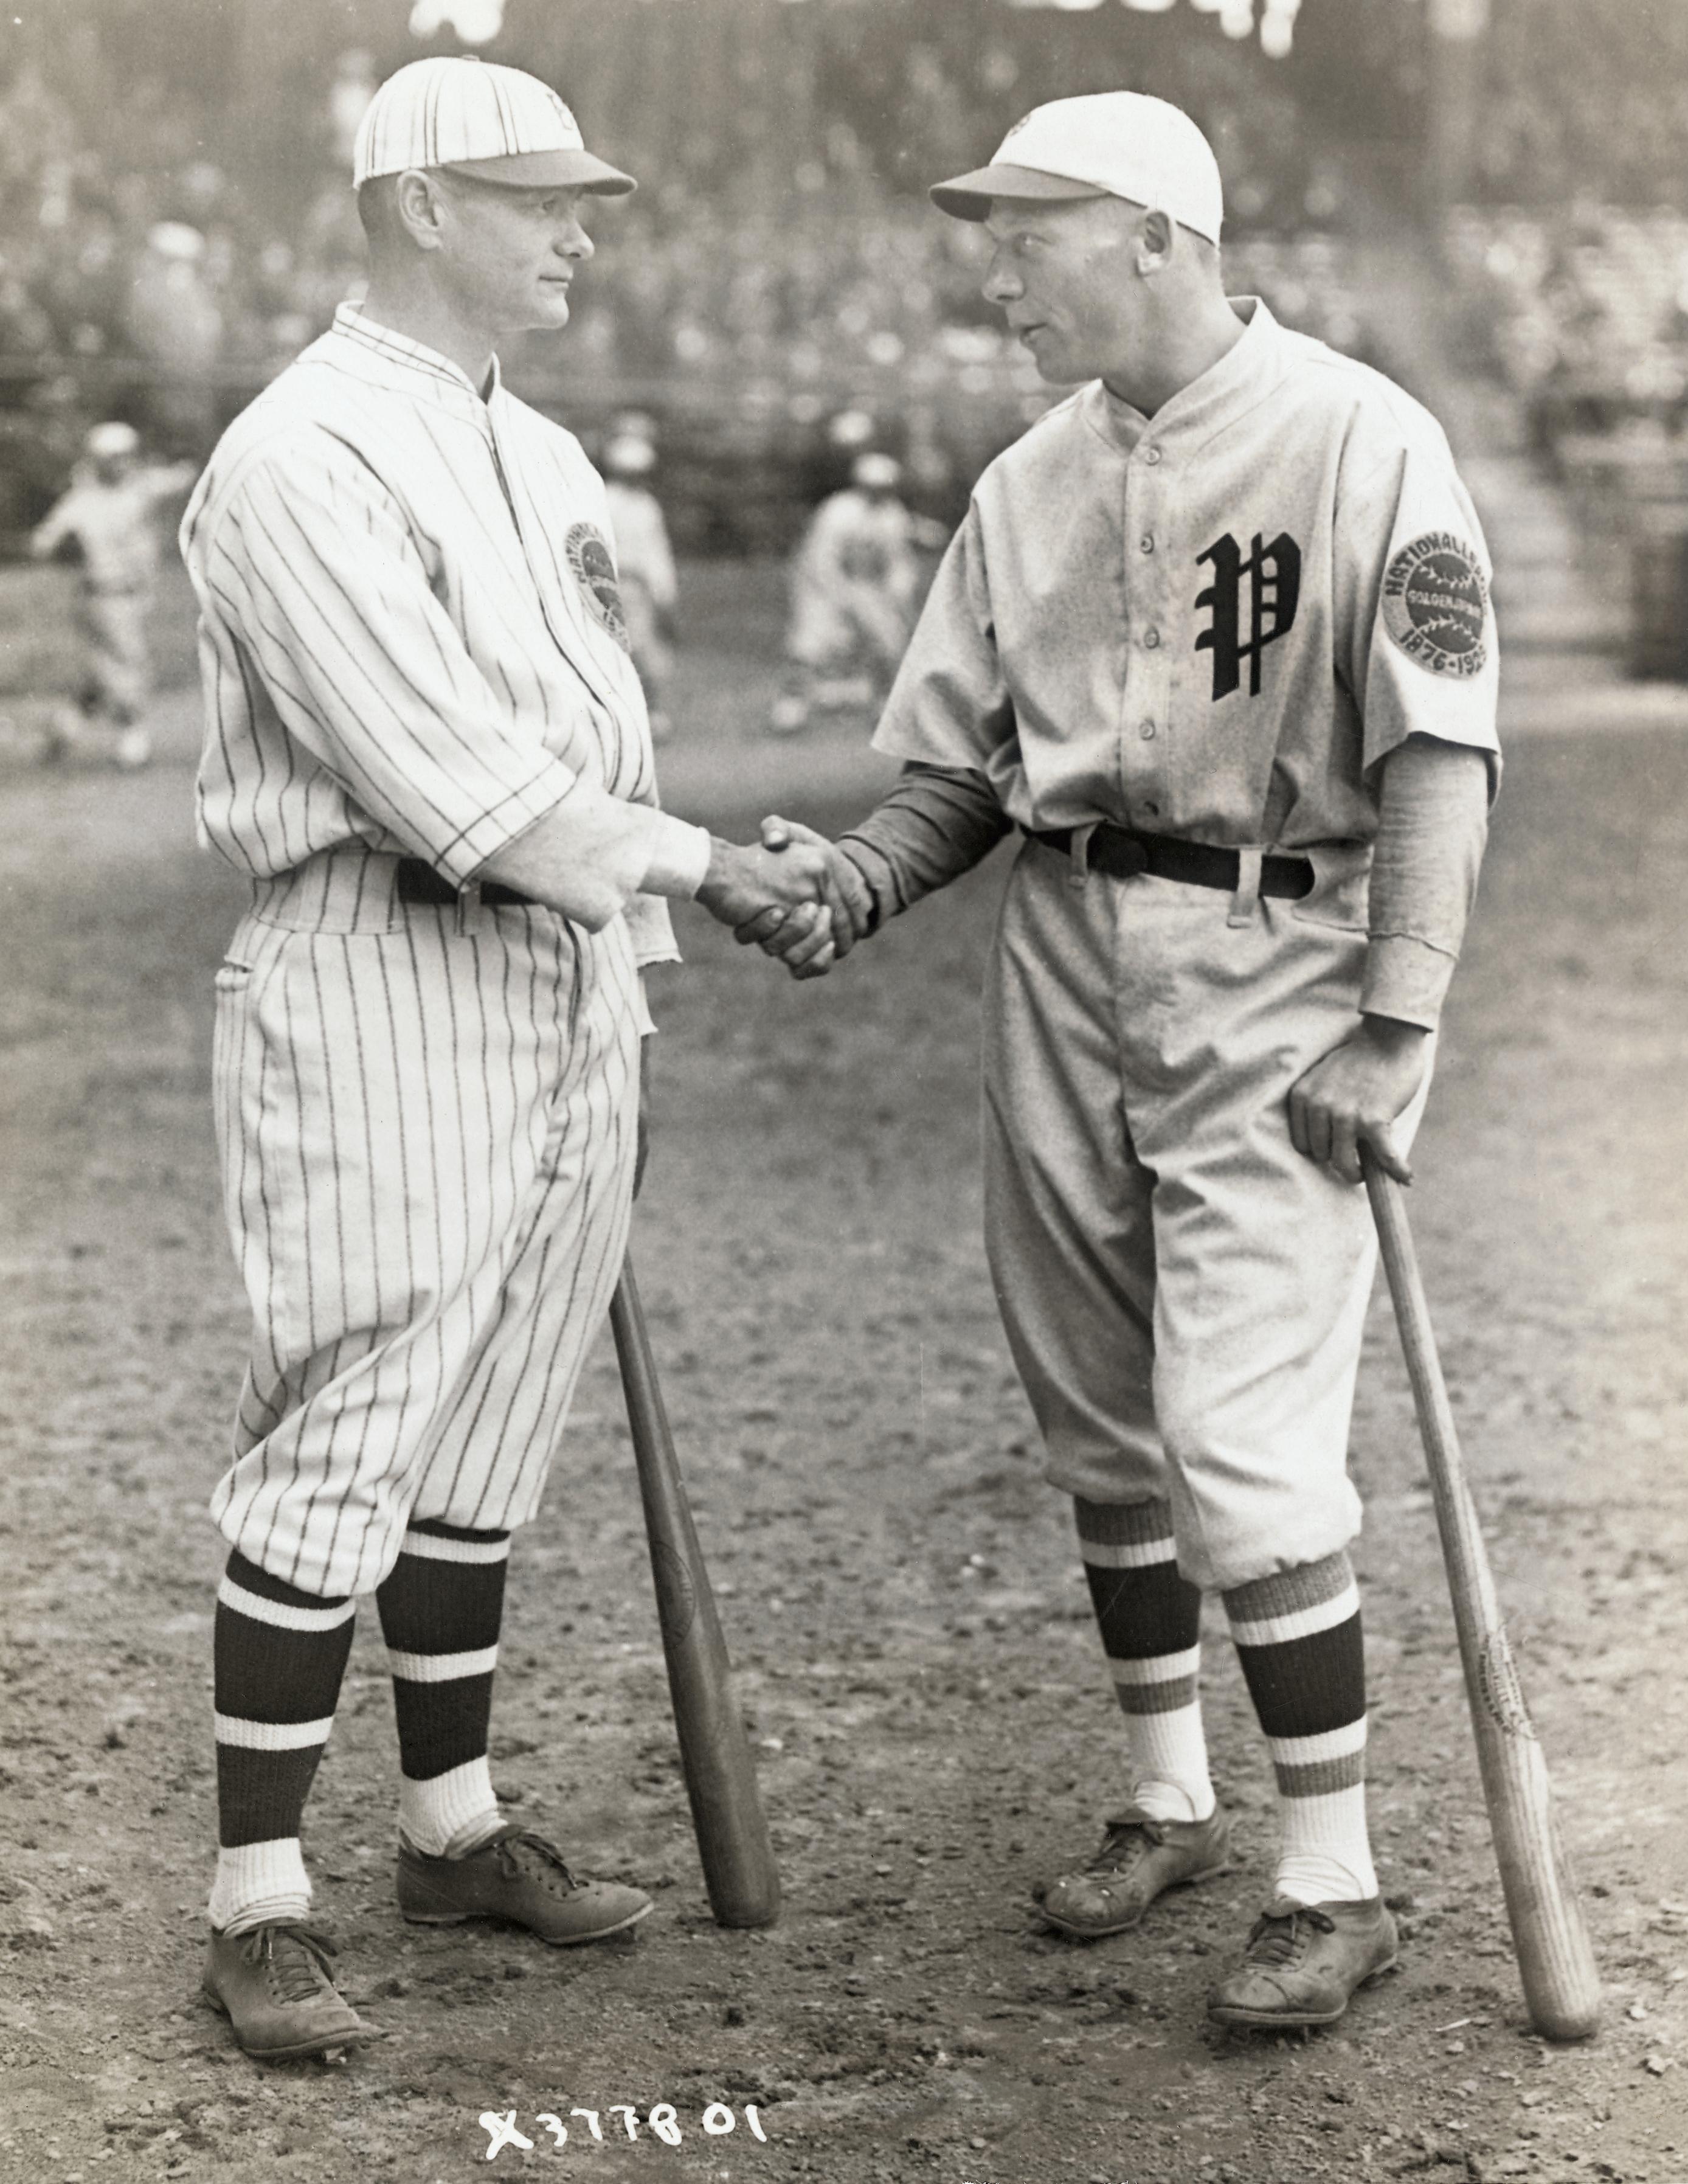 Baseball Captains Shaking Hands